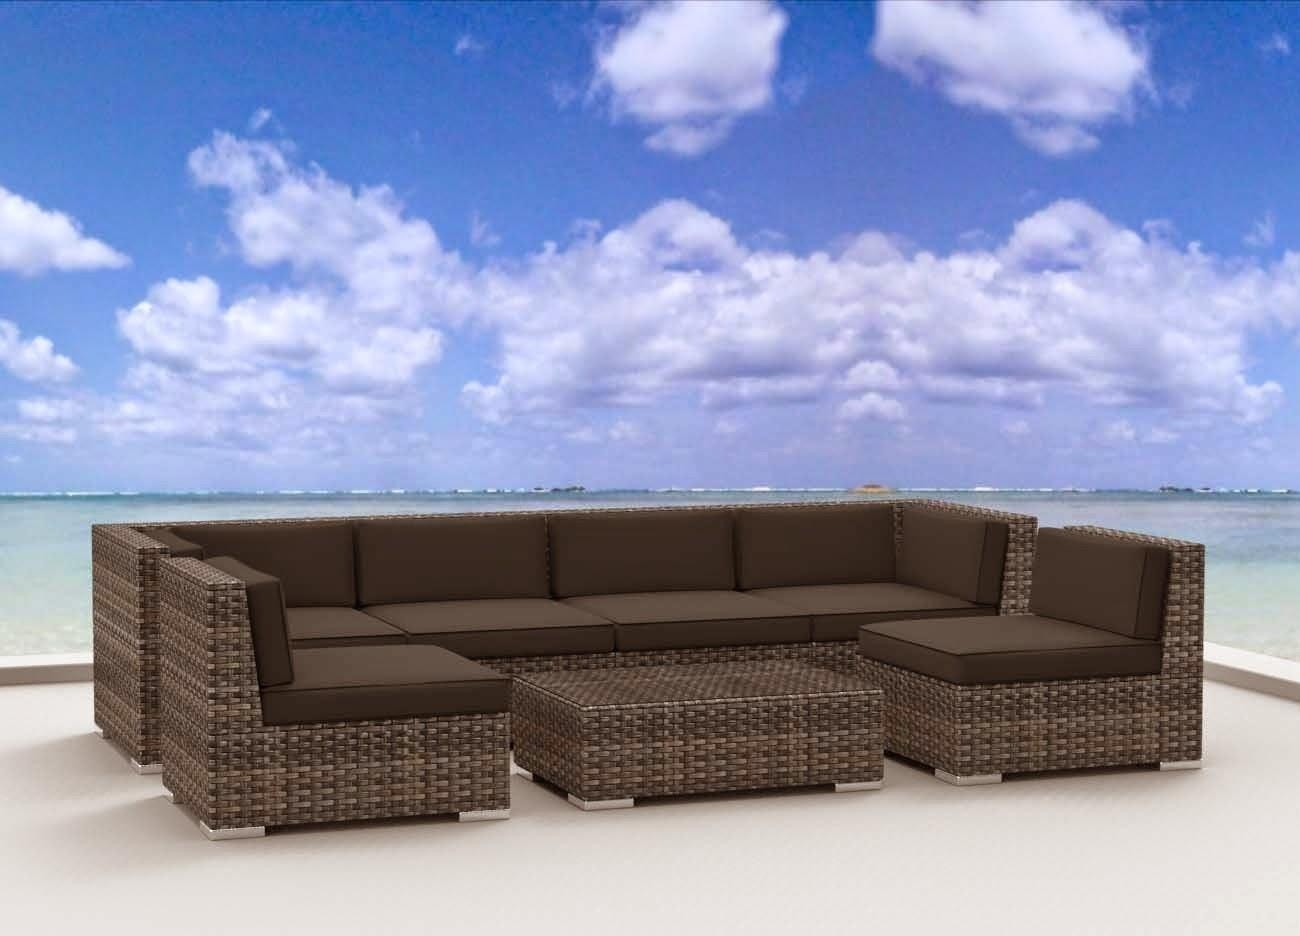 Urban Furnishing Modern Outdoor Backyard Wicker Rattan Patio Inside Modern Rattan Sofas (View 12 of 23)